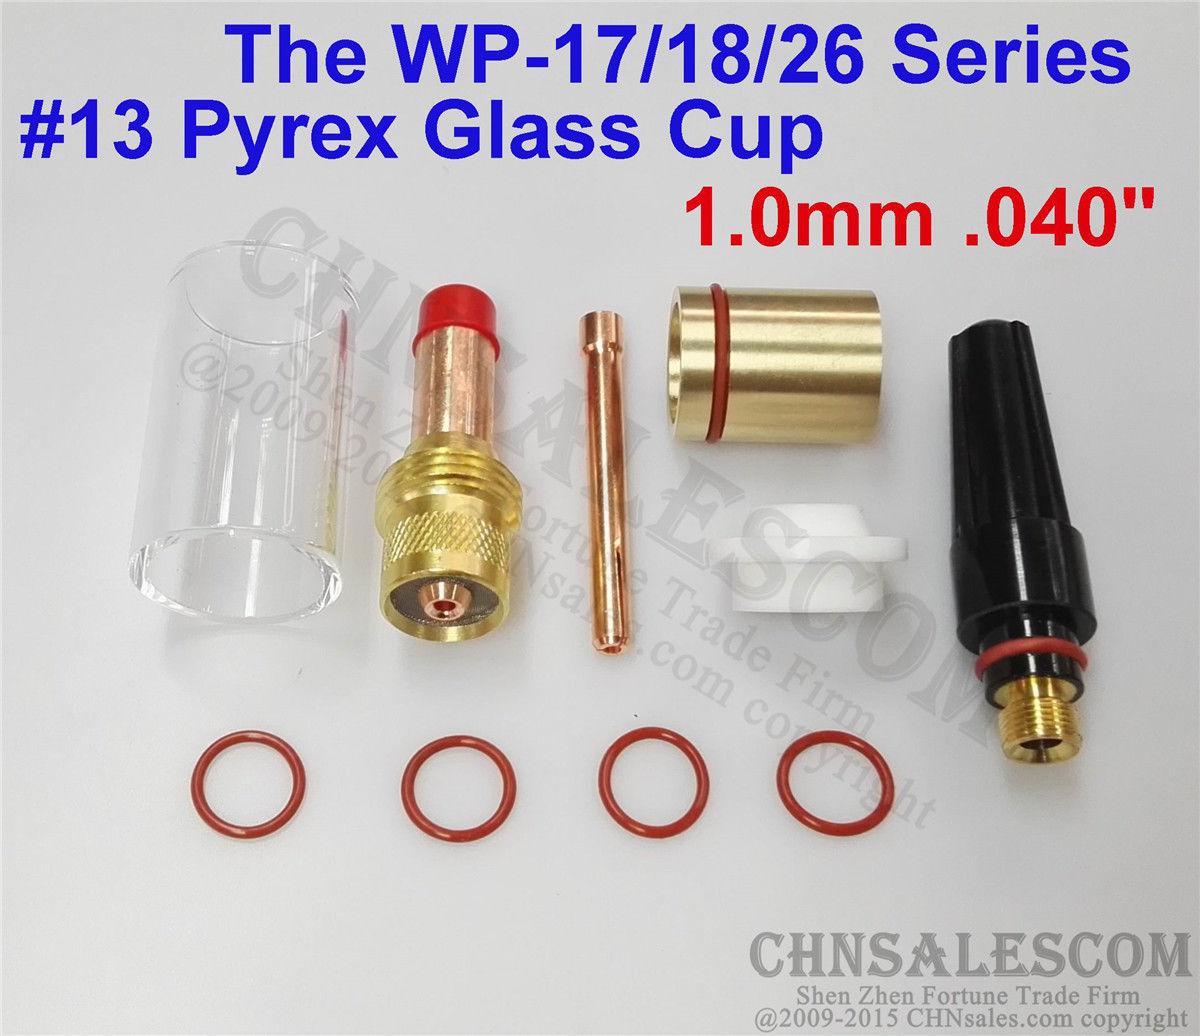 "CHNsalescom10 piezas de soldadura TIG 45V24 Gas lente #13 Pyrex taza Kit para Tig WP-17/18/26 040"""